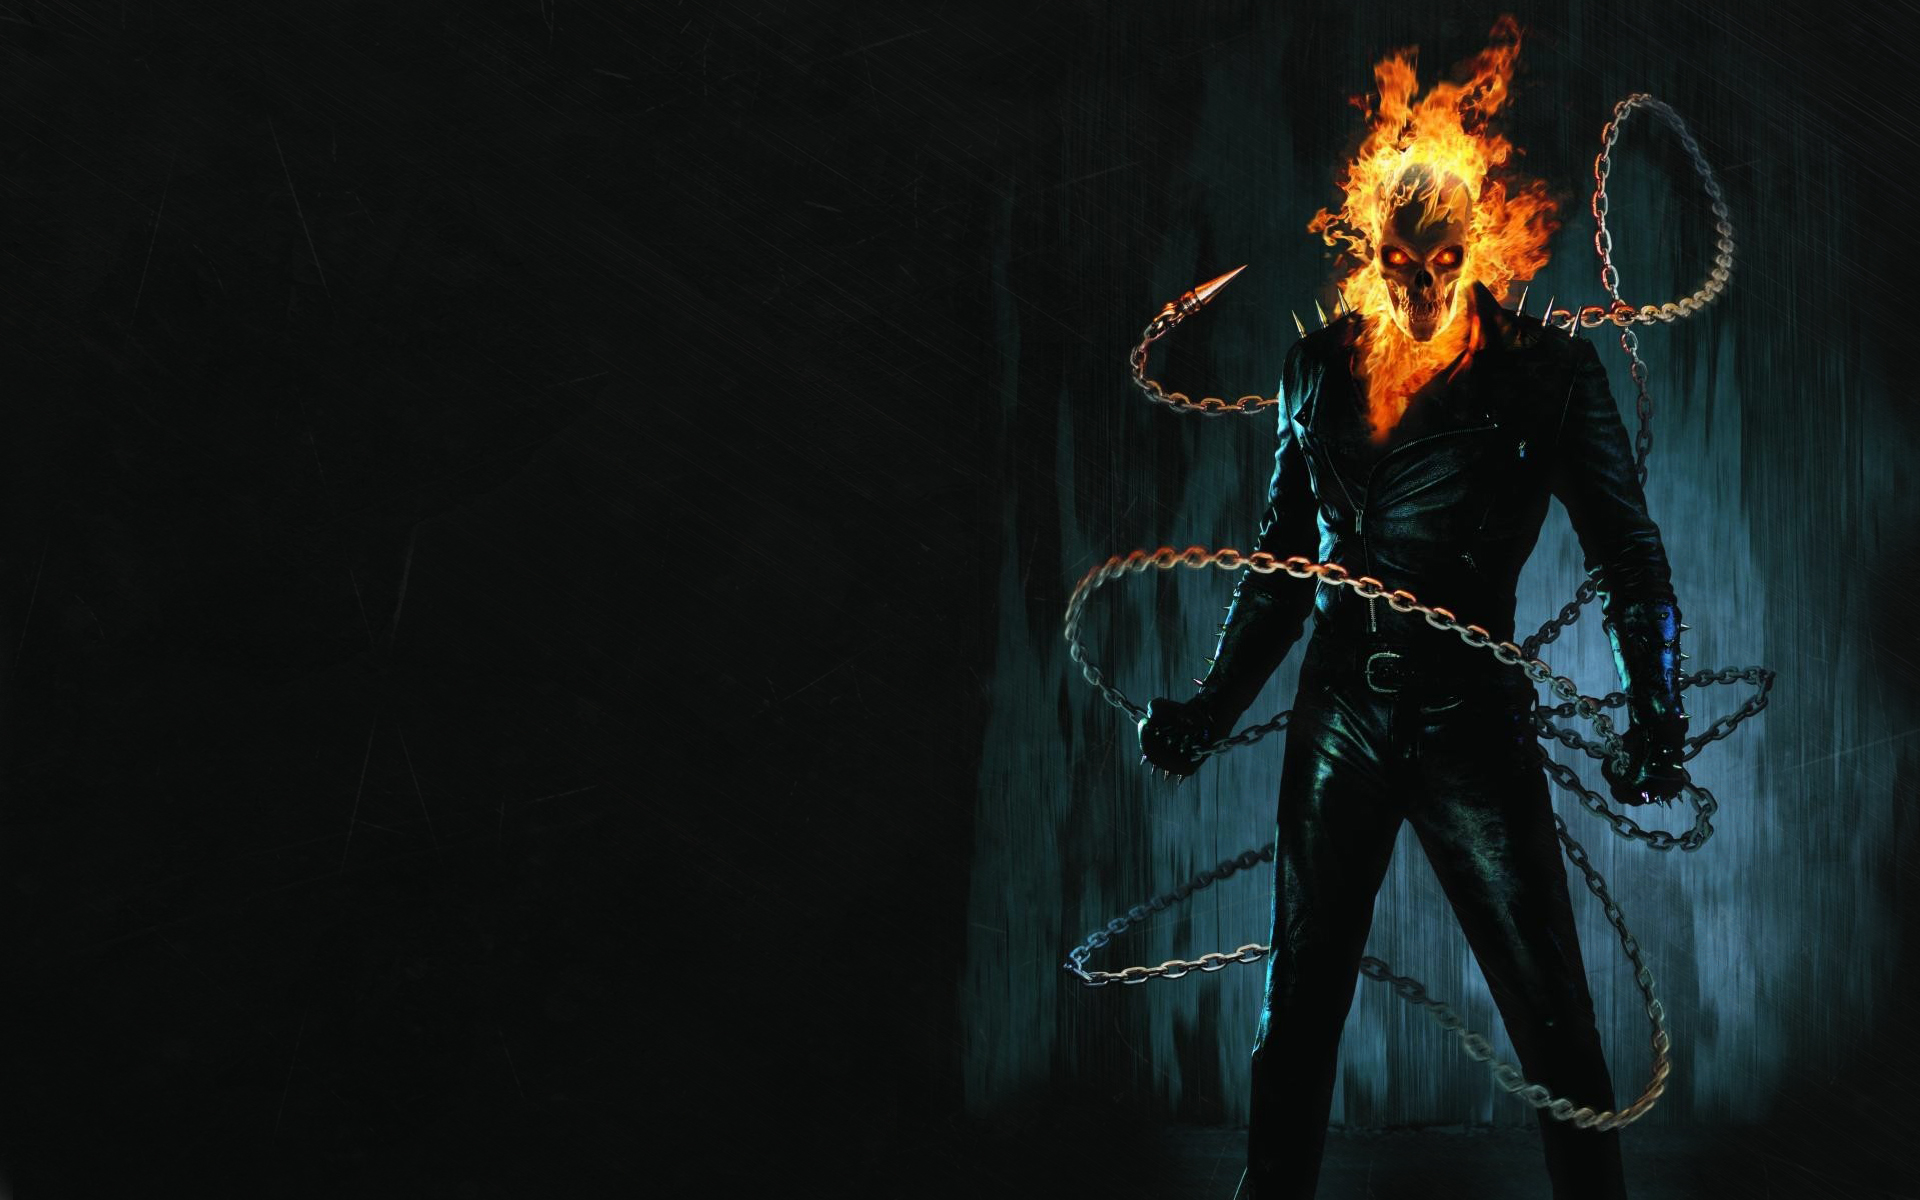 Ghost Rider comics movies dark skull skeleton fire wallpaper 1920x1200